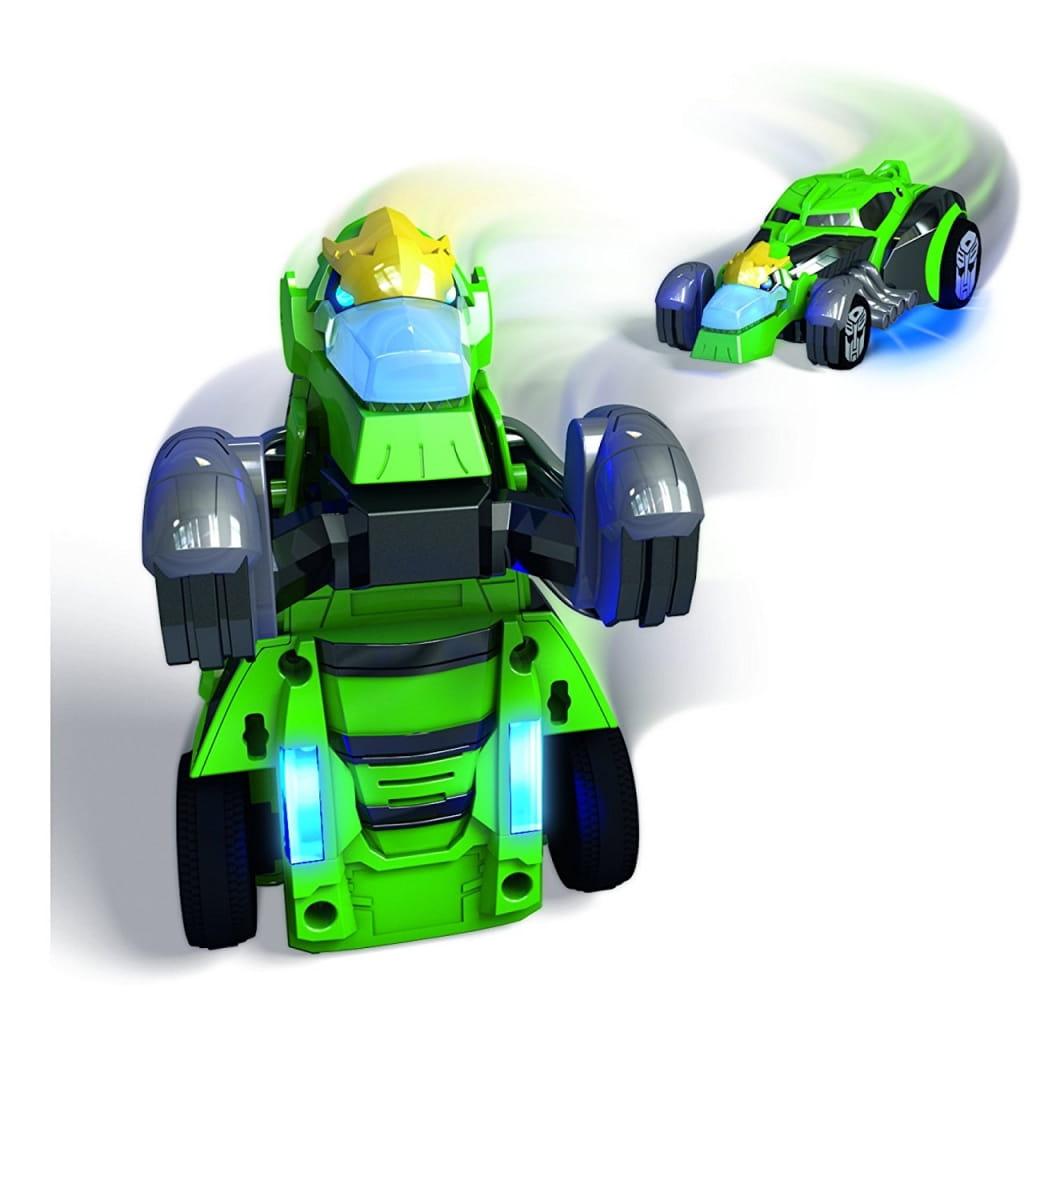 Машинка-трансформер Transformers Grimlock со светом и звуком  15 см (Dickie) - Машинки и самолетики